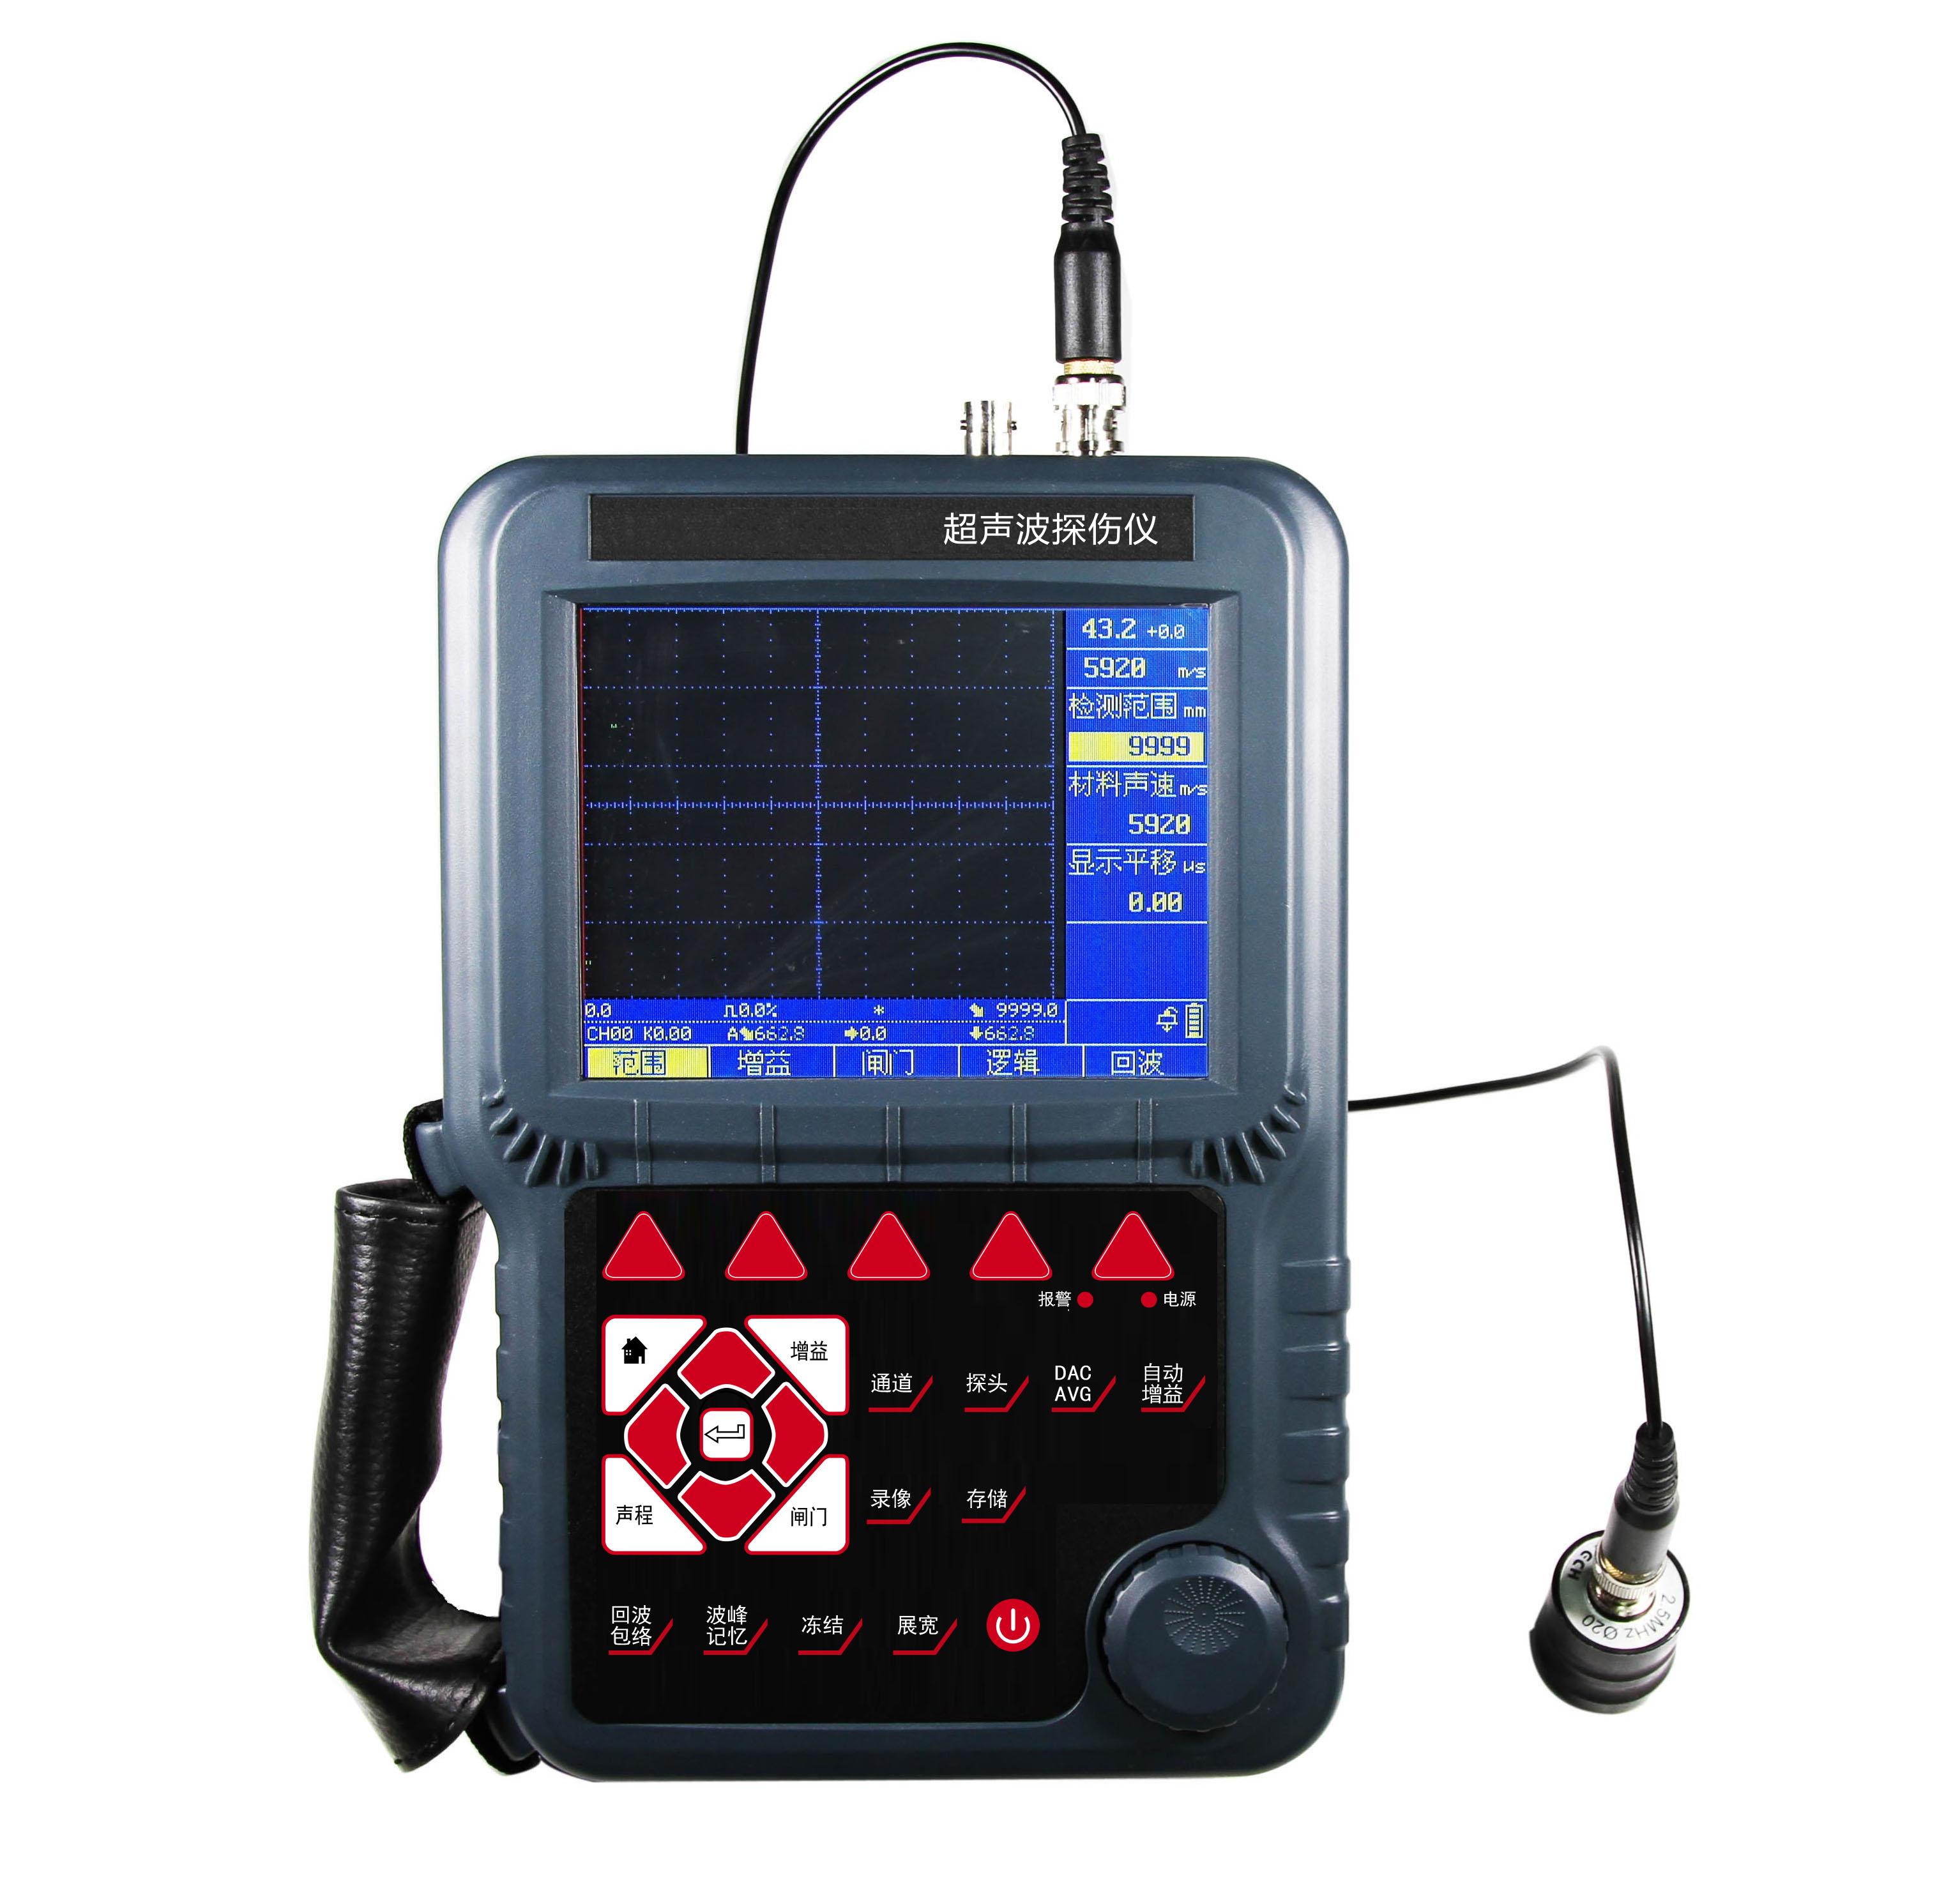 JT-TS330全数字超声波探伤仪(升级款)